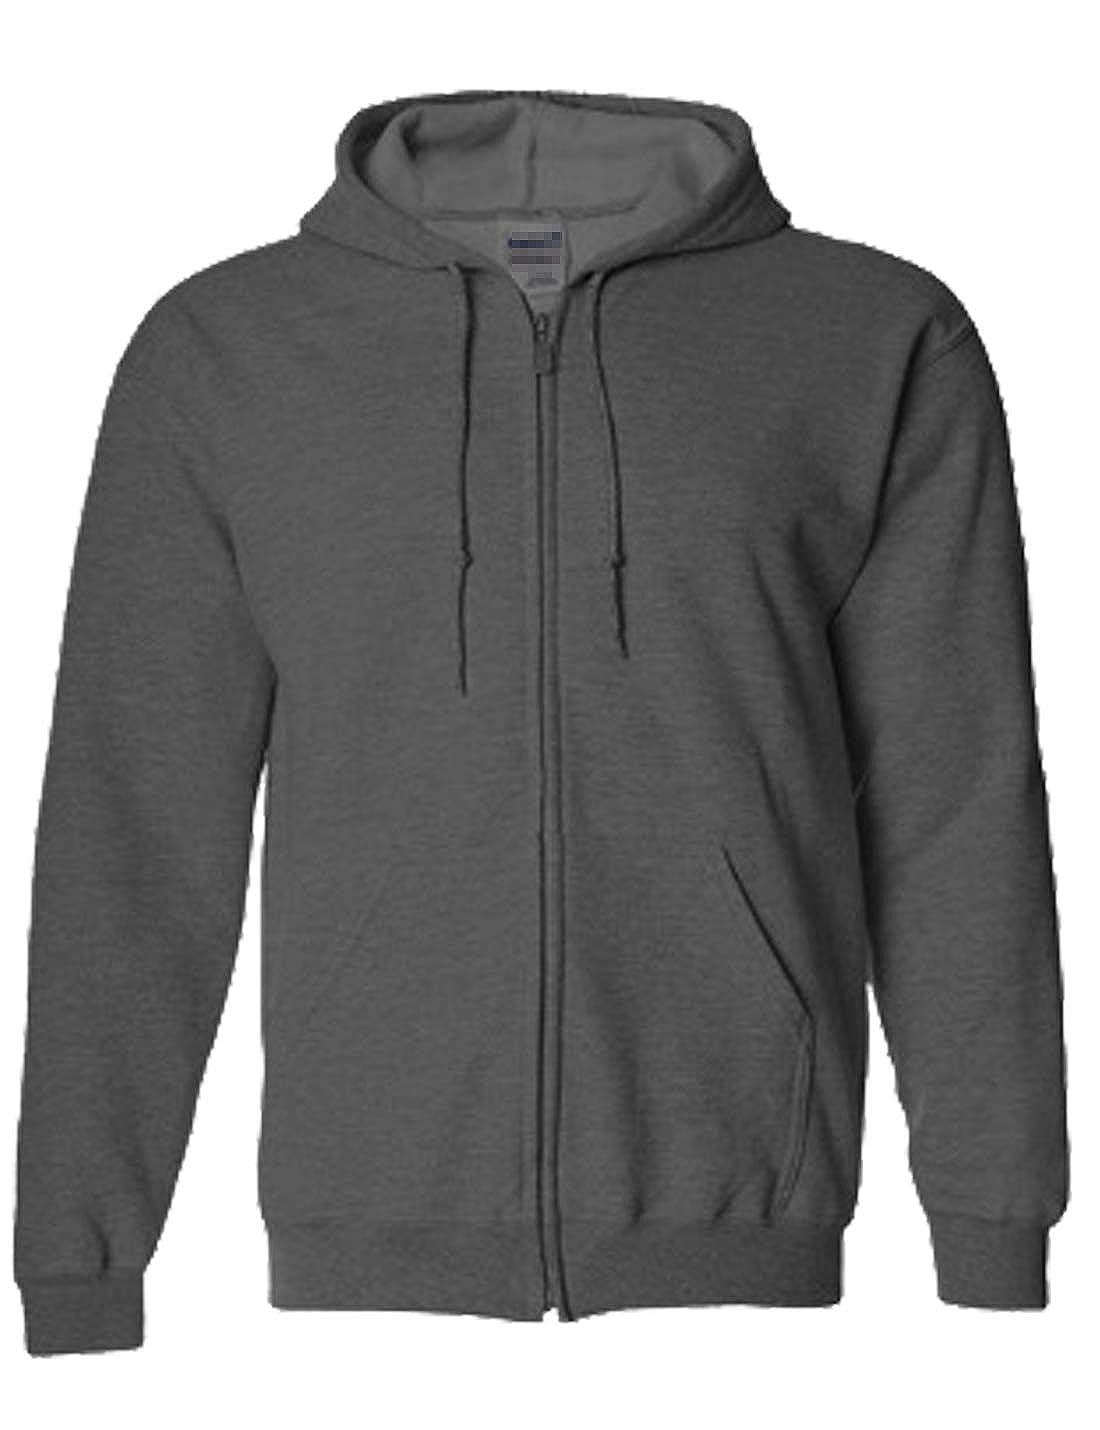 Liengoron Mens Fashion Hoodies Full Sleeve-Front Zip Sweatshirts with Kanga Pocket